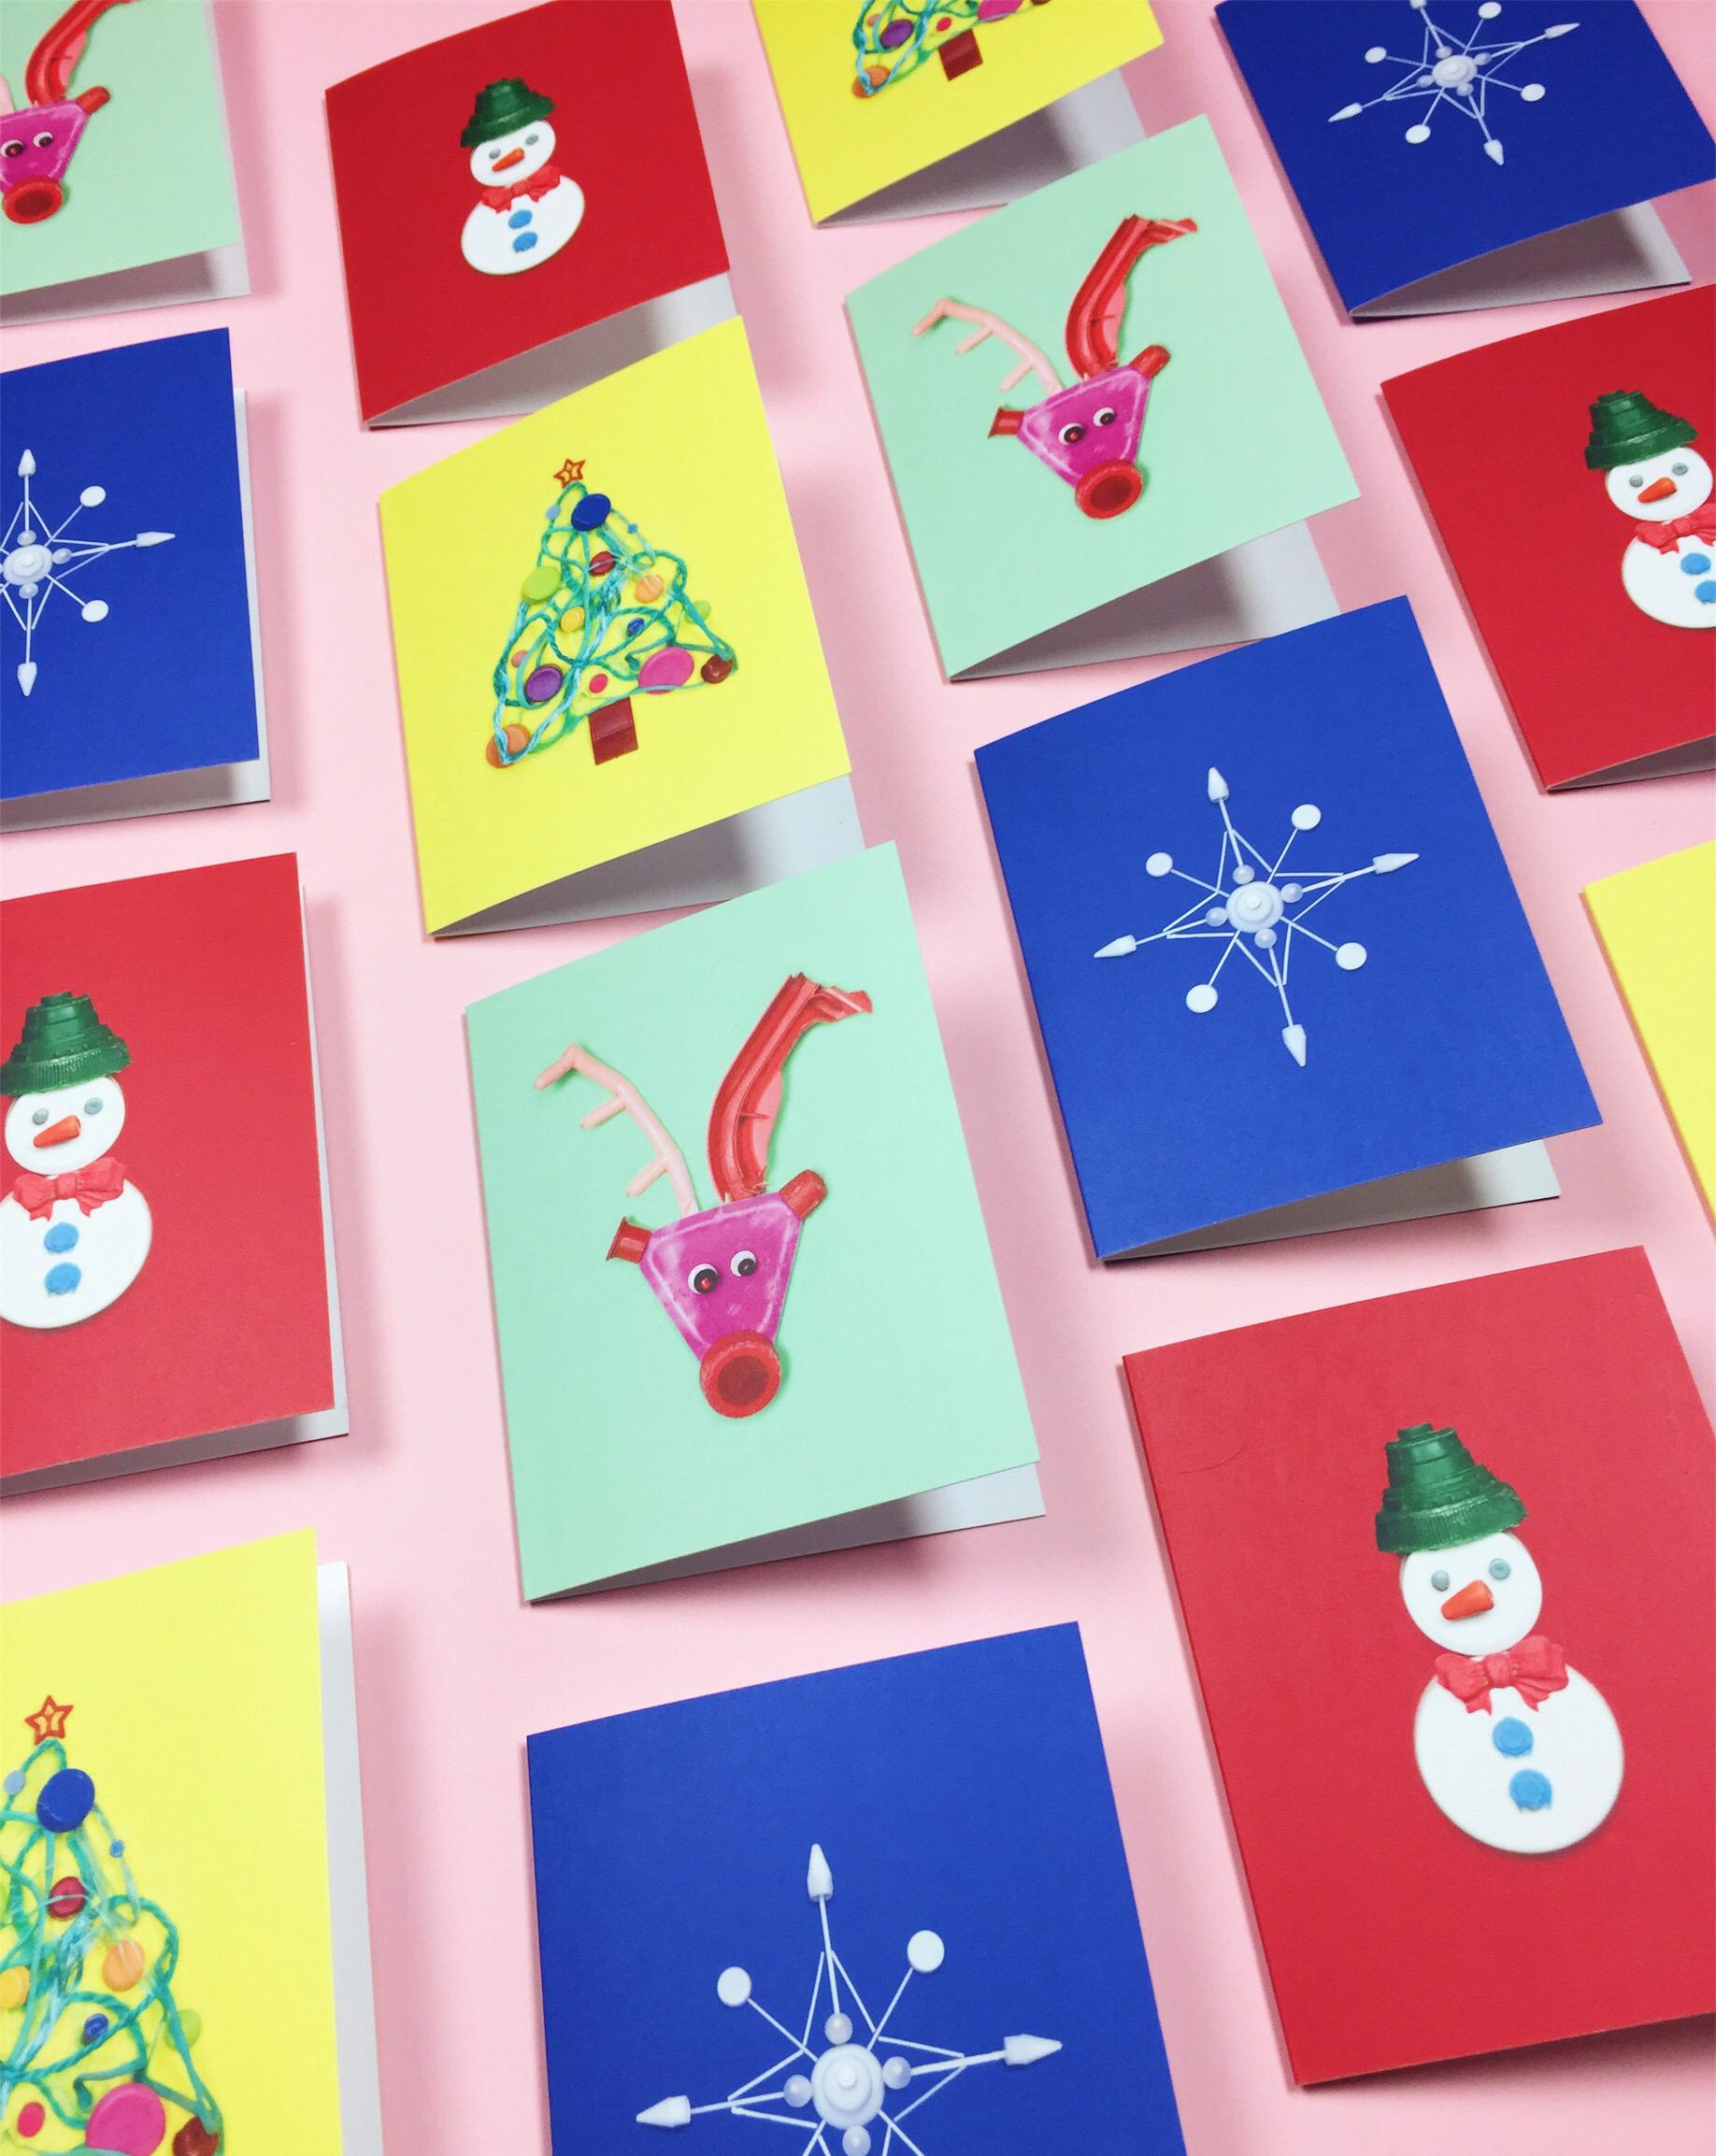 beach_plastic_holiday_christmas_greeting_cards_amy_chen_design_esty.jpg